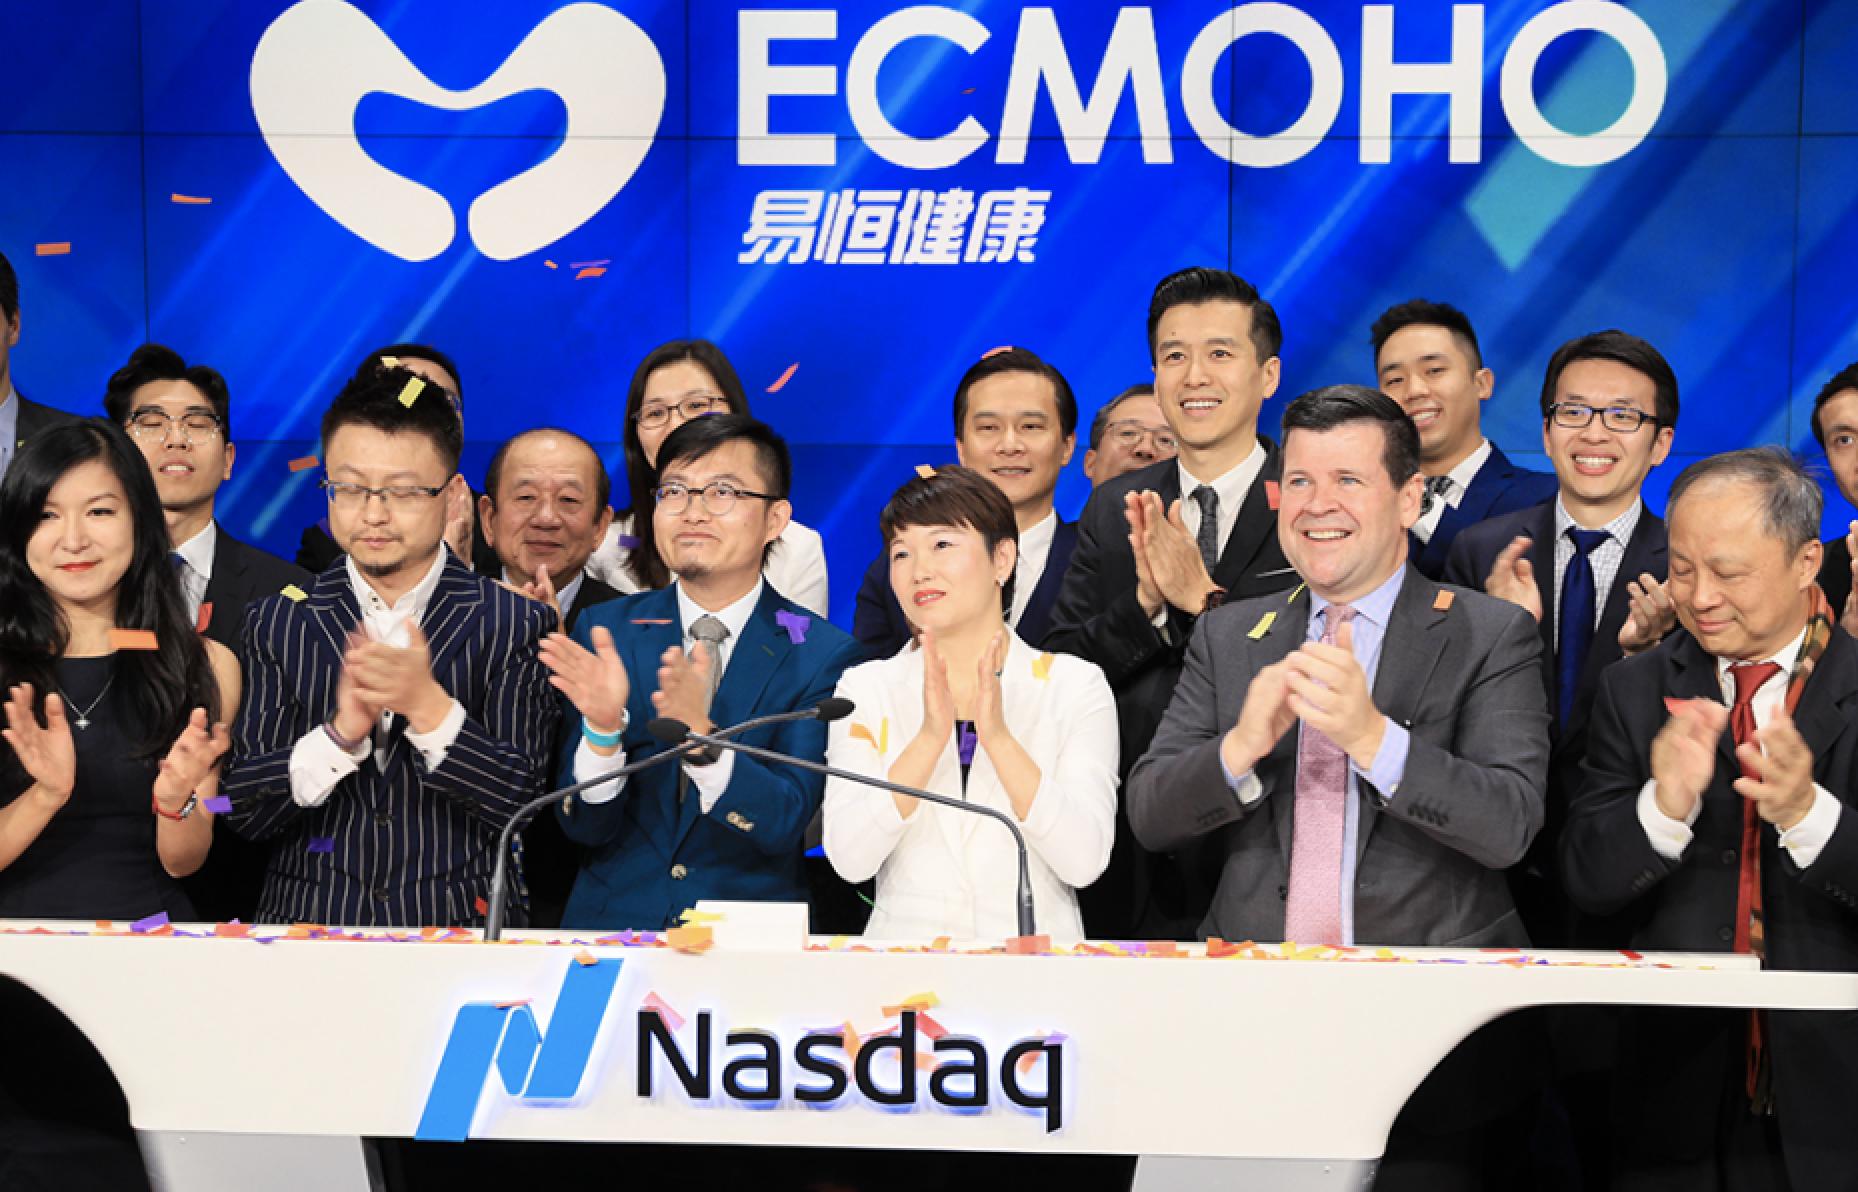 Ecmoho, a Health and Wellness Company, Raises $44 Million in New York IPO